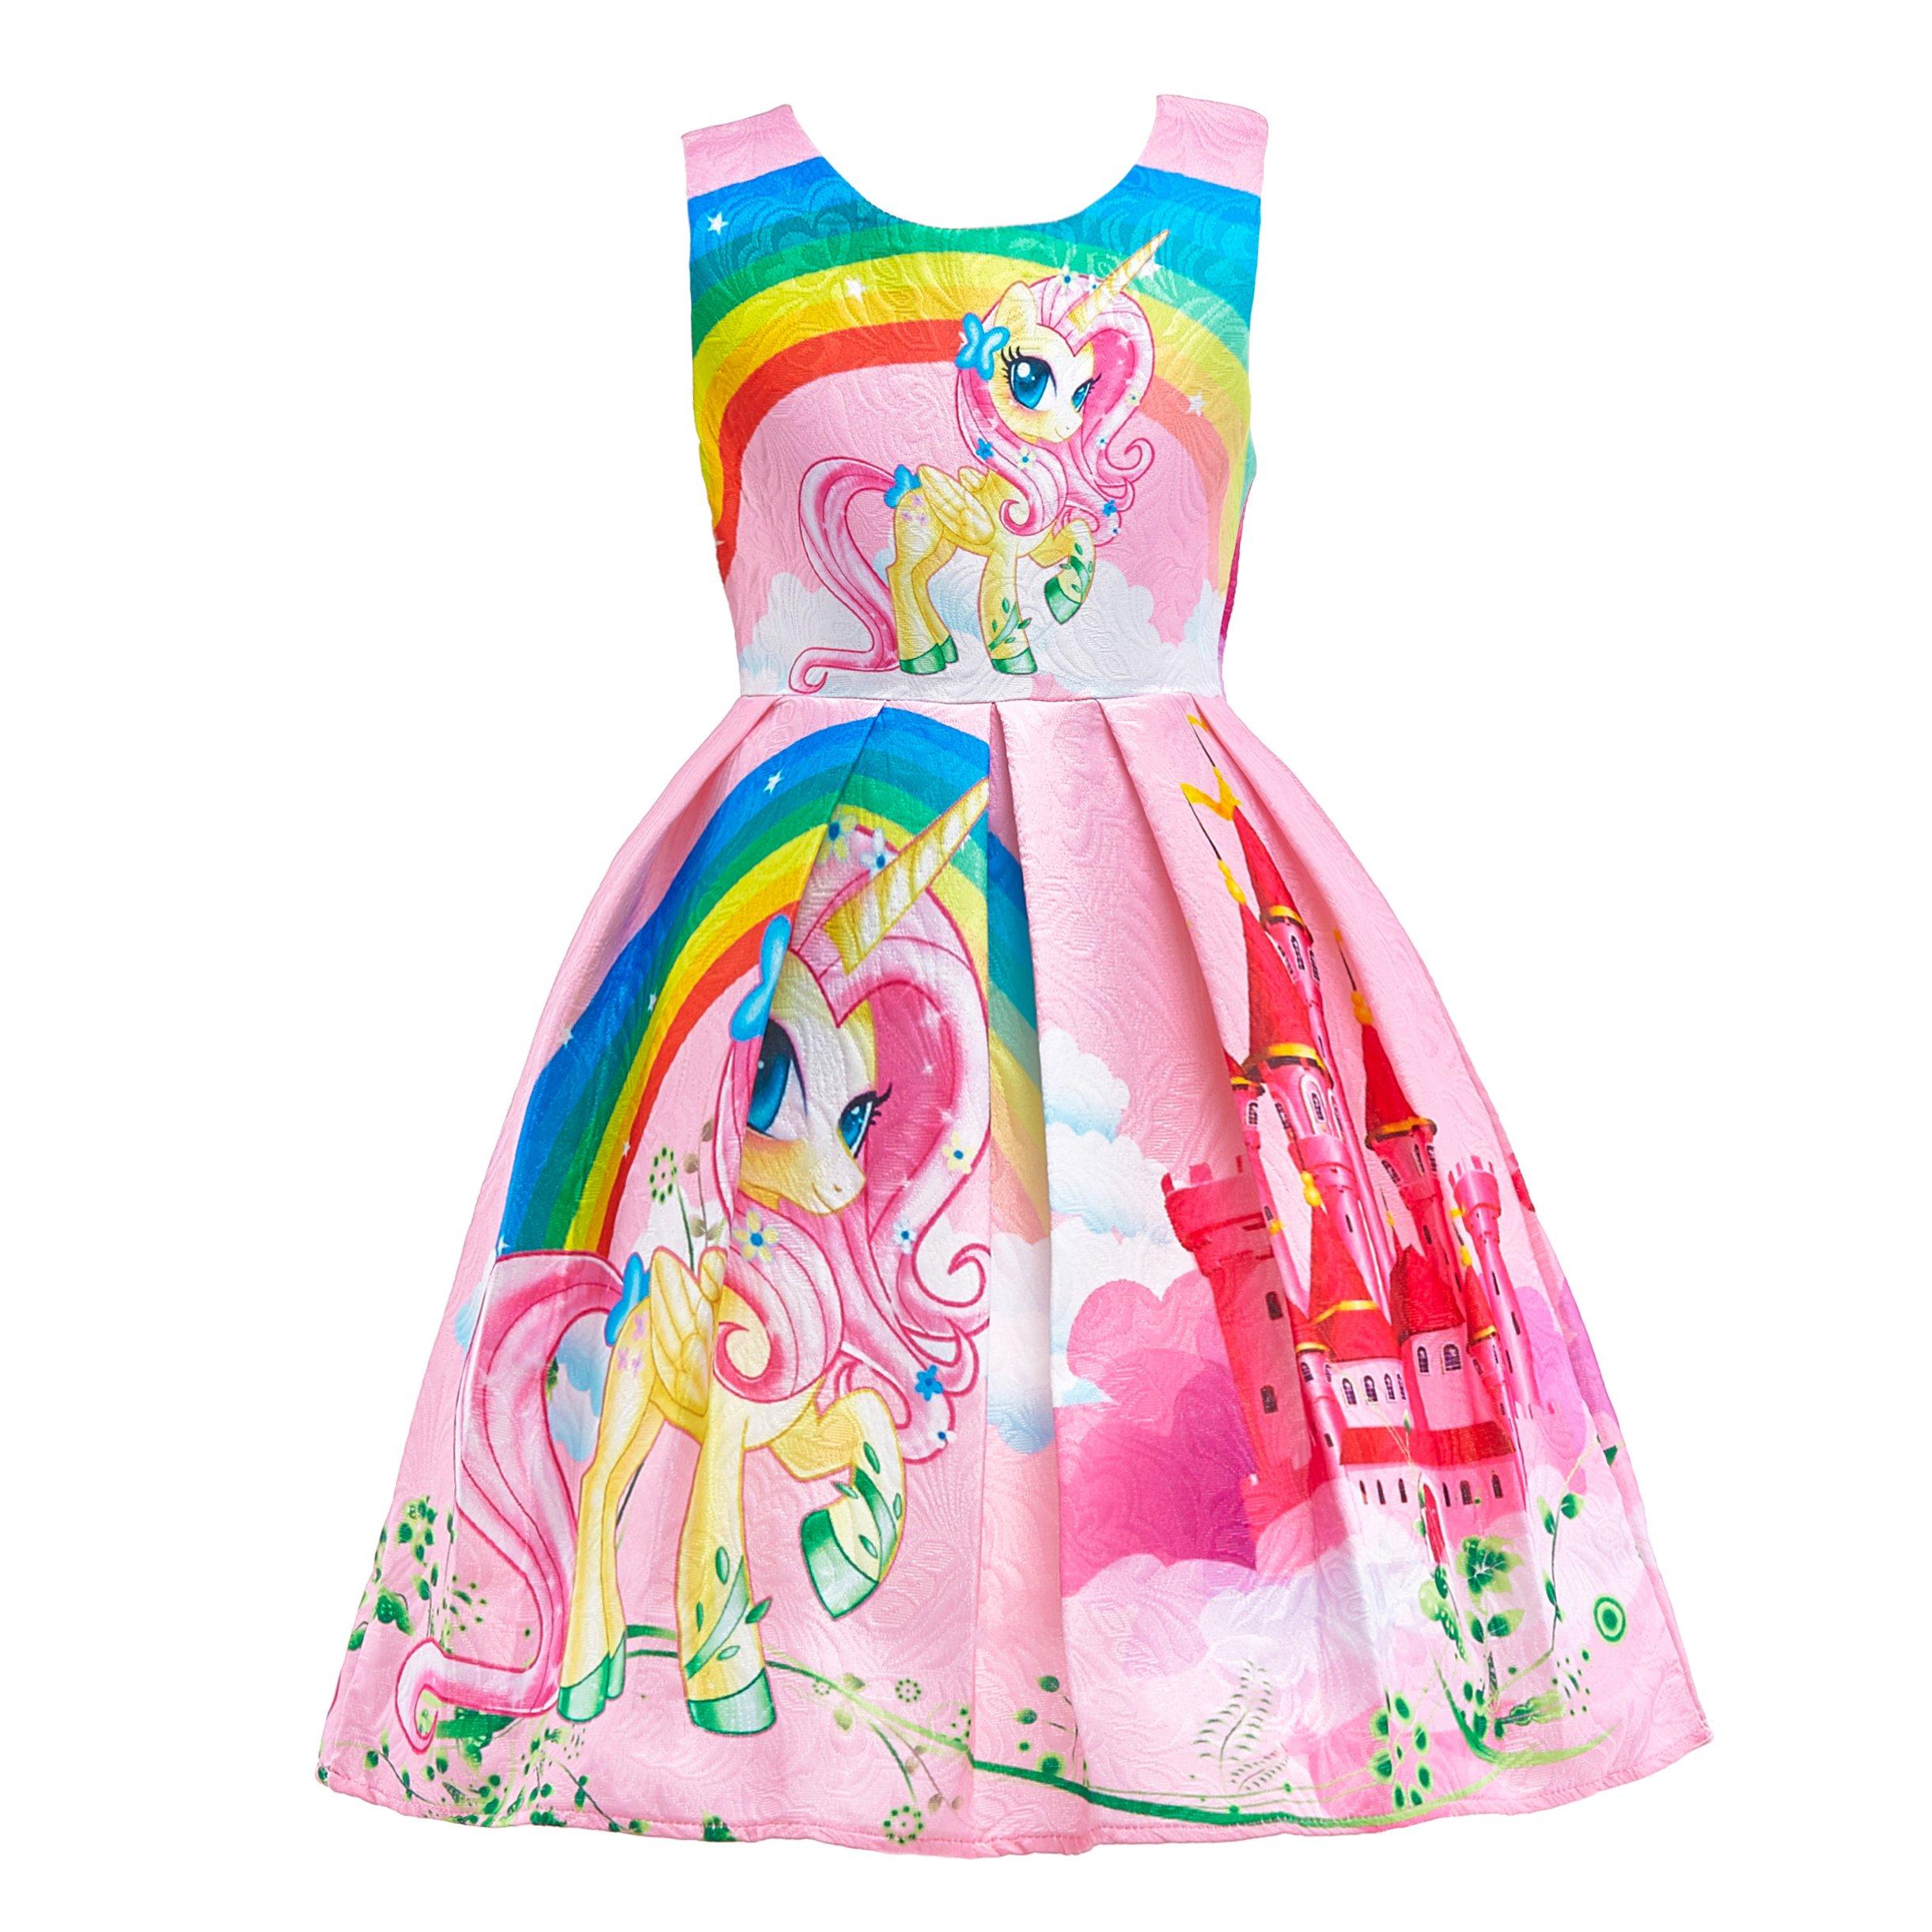 Dressy Daisy Girls My Little Pony Dress Costumes Unicorn Costumes Fancy Dress up Size 6 Pink FC127